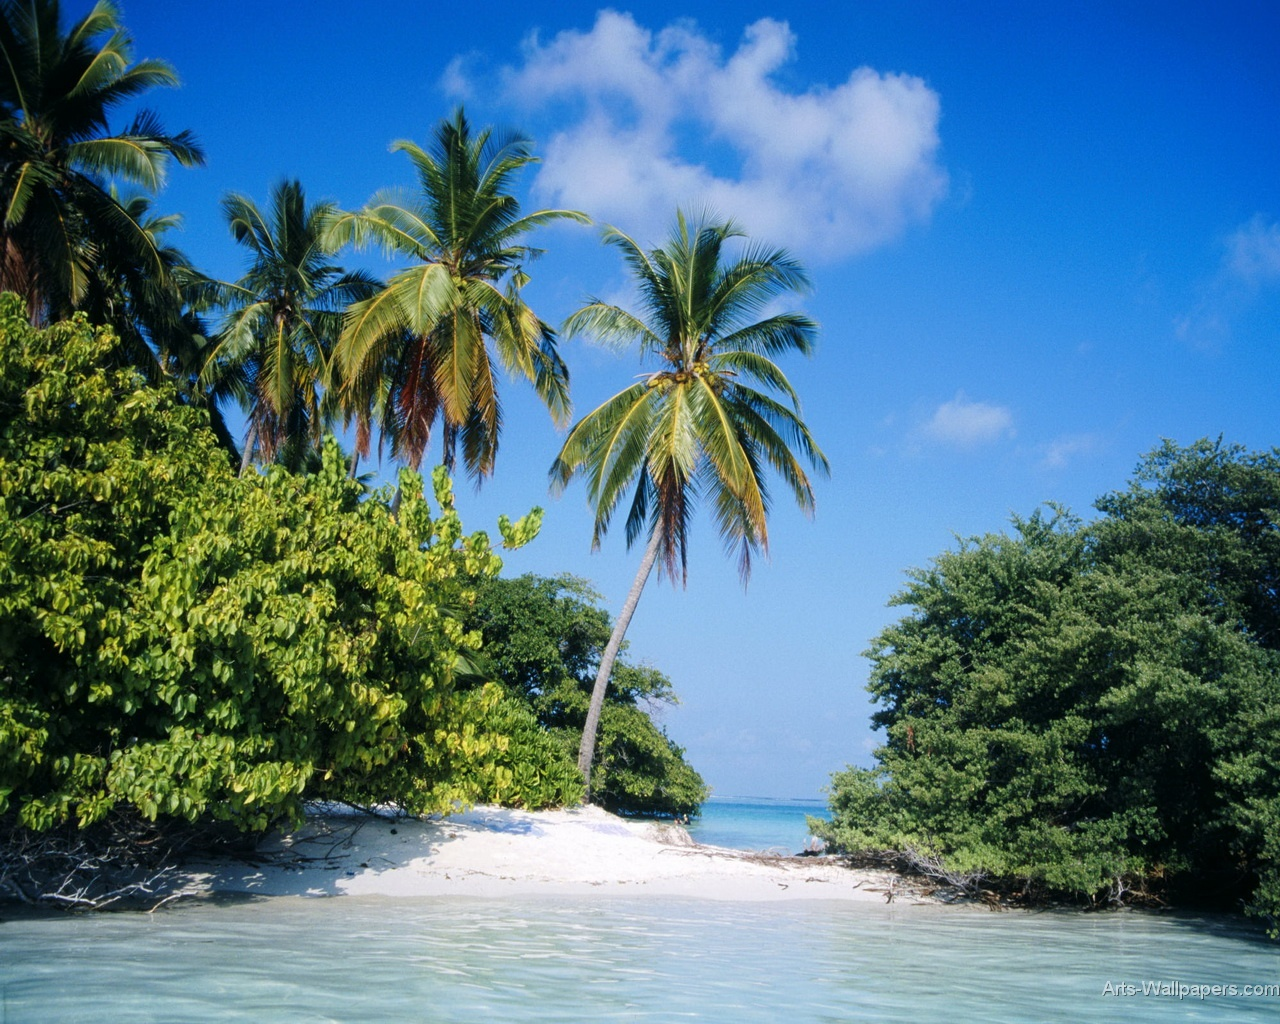 Hd Tropical Island Beach Paradise Wallpapers And Backgrounds: Tropical Island Paradise Wallpaper